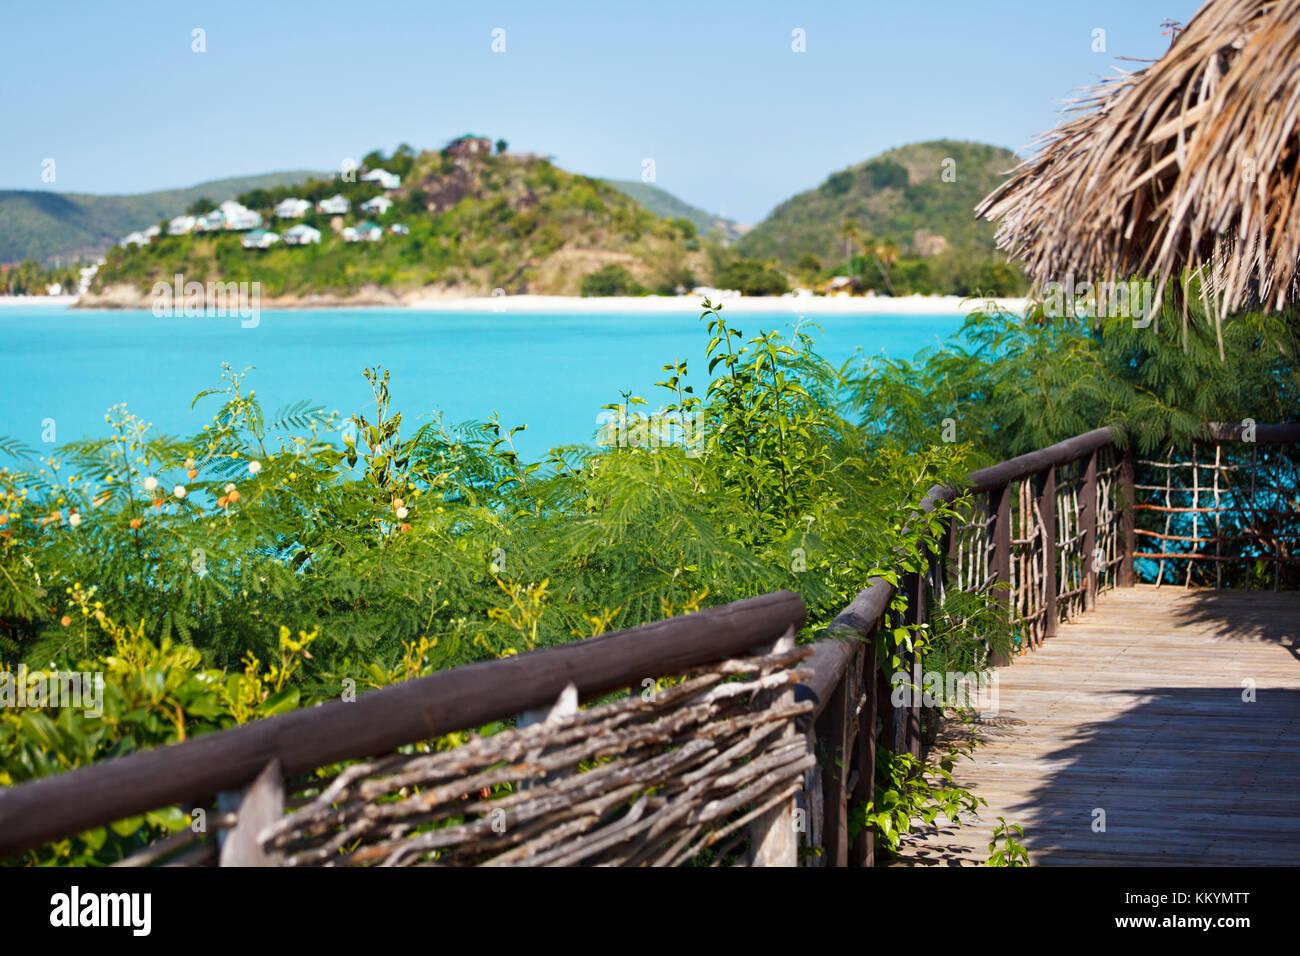 turquoise coast hotel villa stock photos turquoise coast. Black Bedroom Furniture Sets. Home Design Ideas